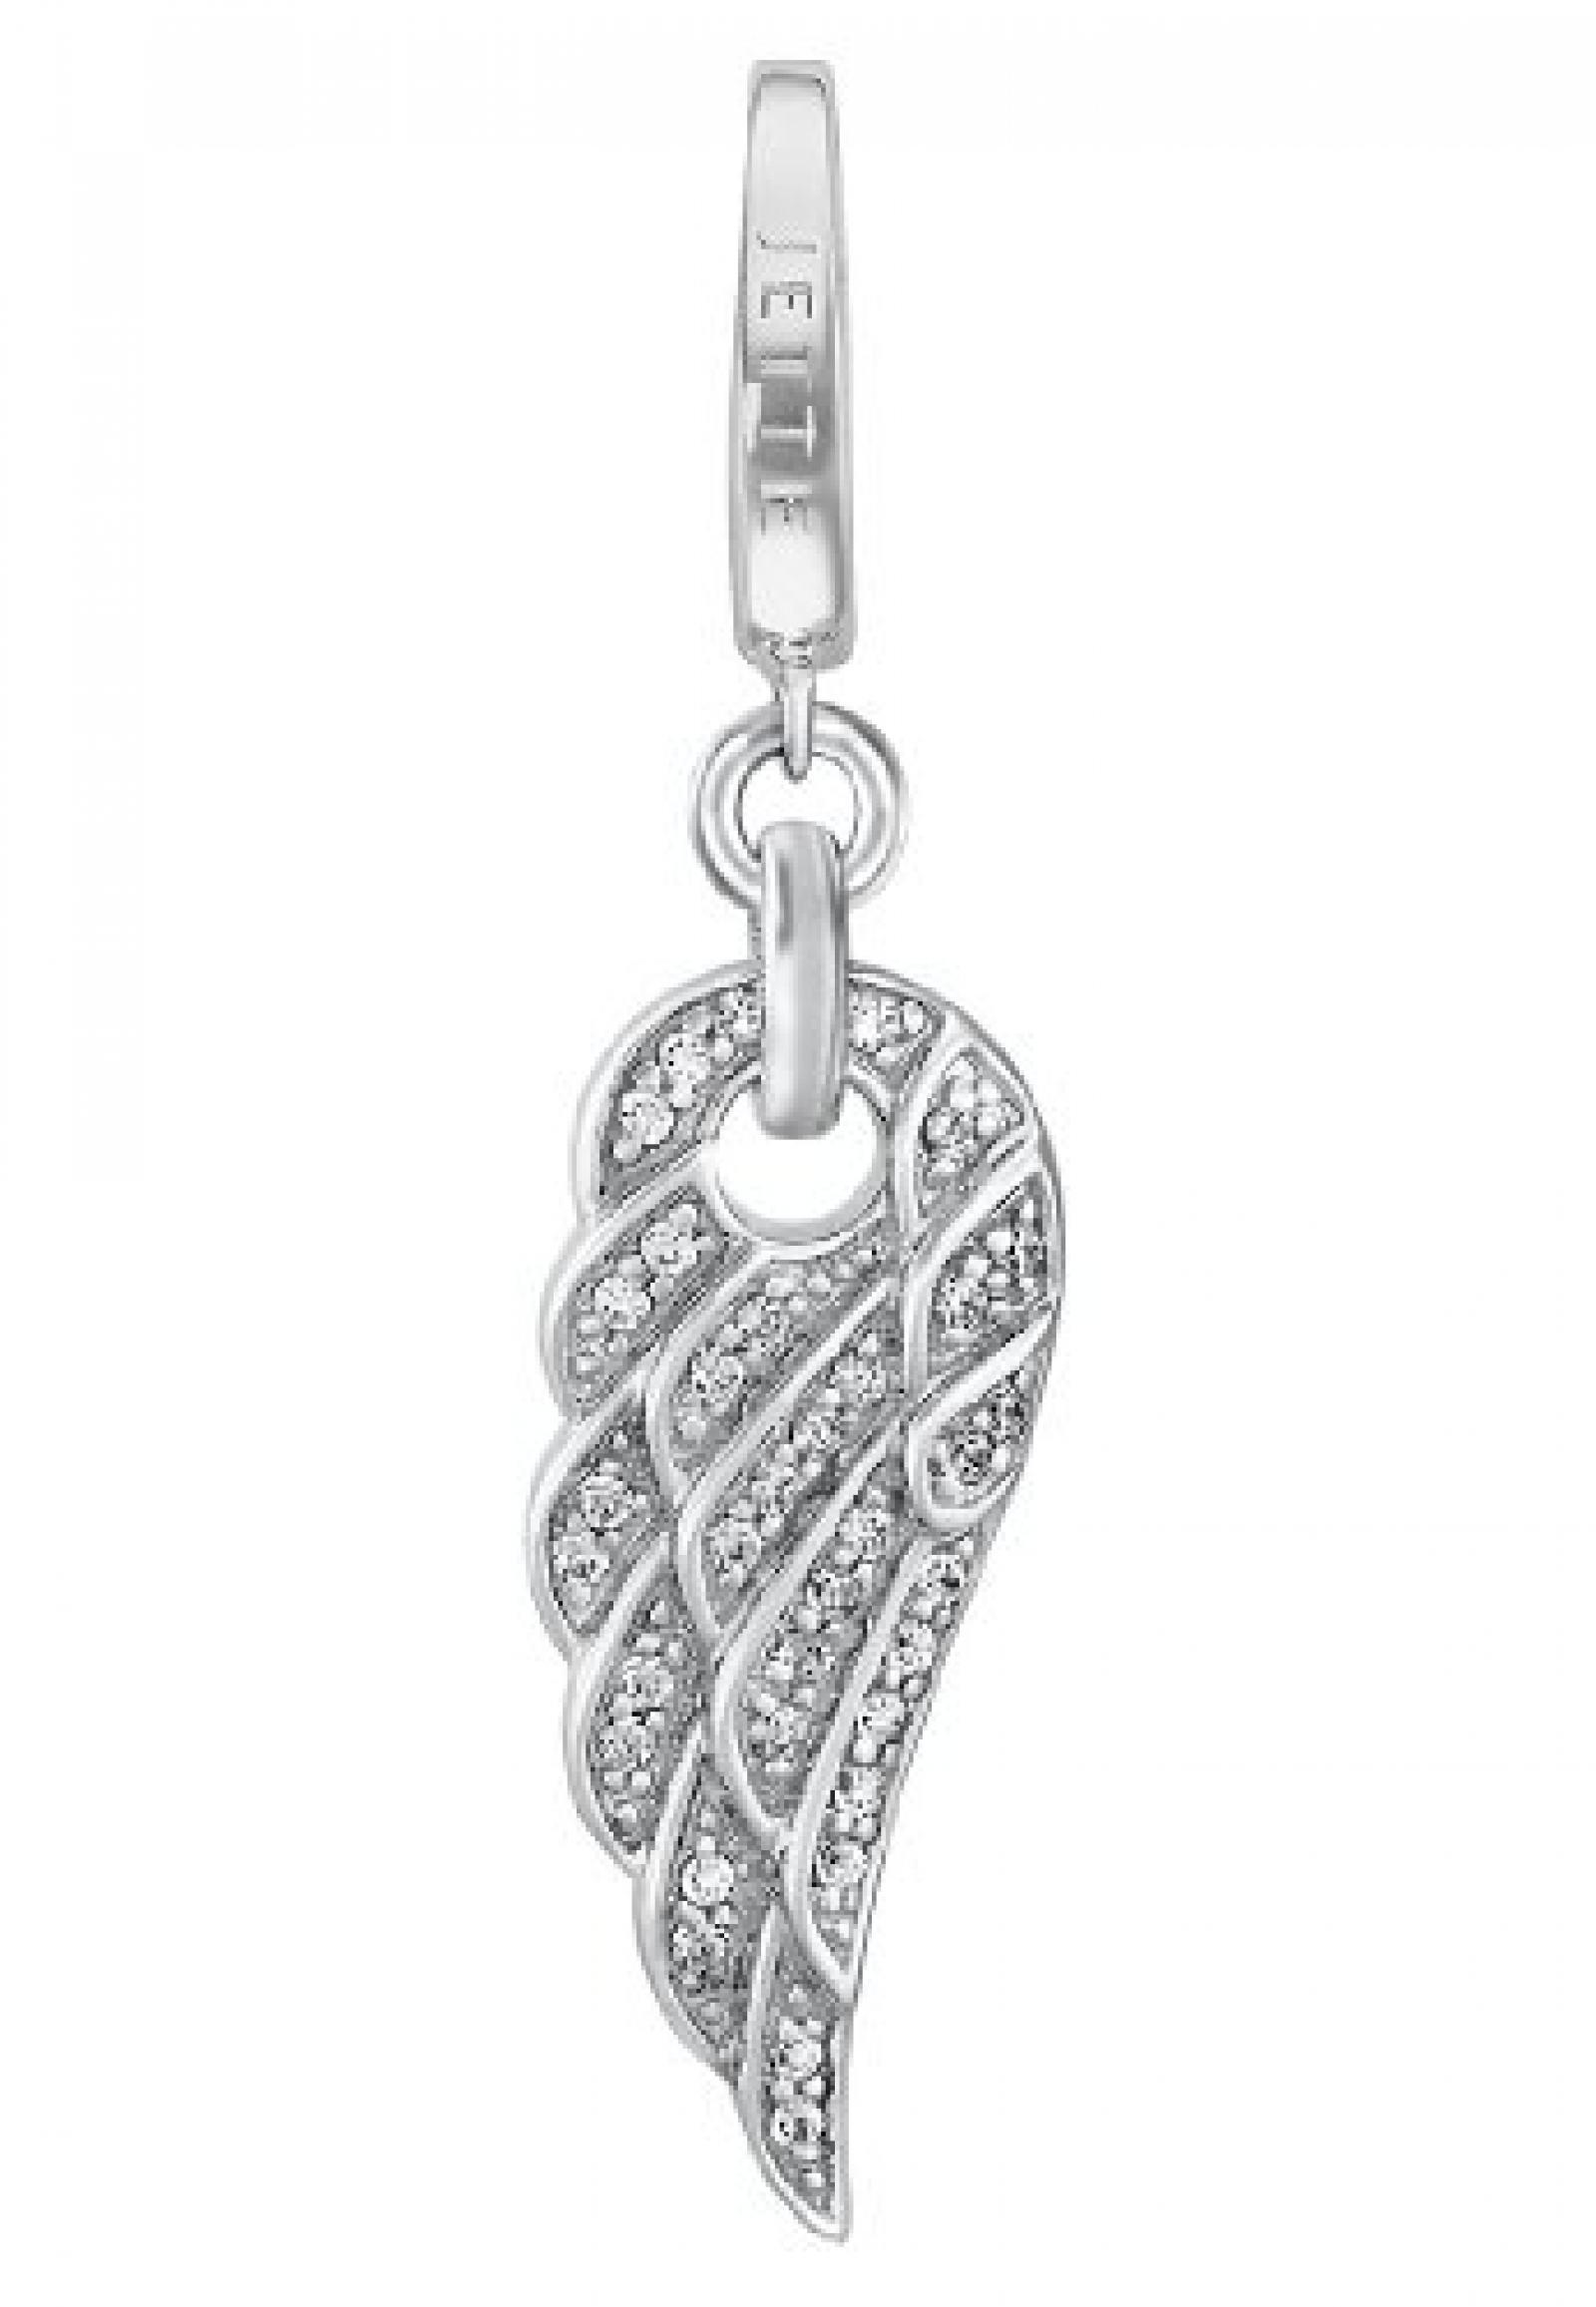 JETTE Charms Damen-Charm Angelwing 925er Silber rhodiniert 35 Zirkonia One Size, silber